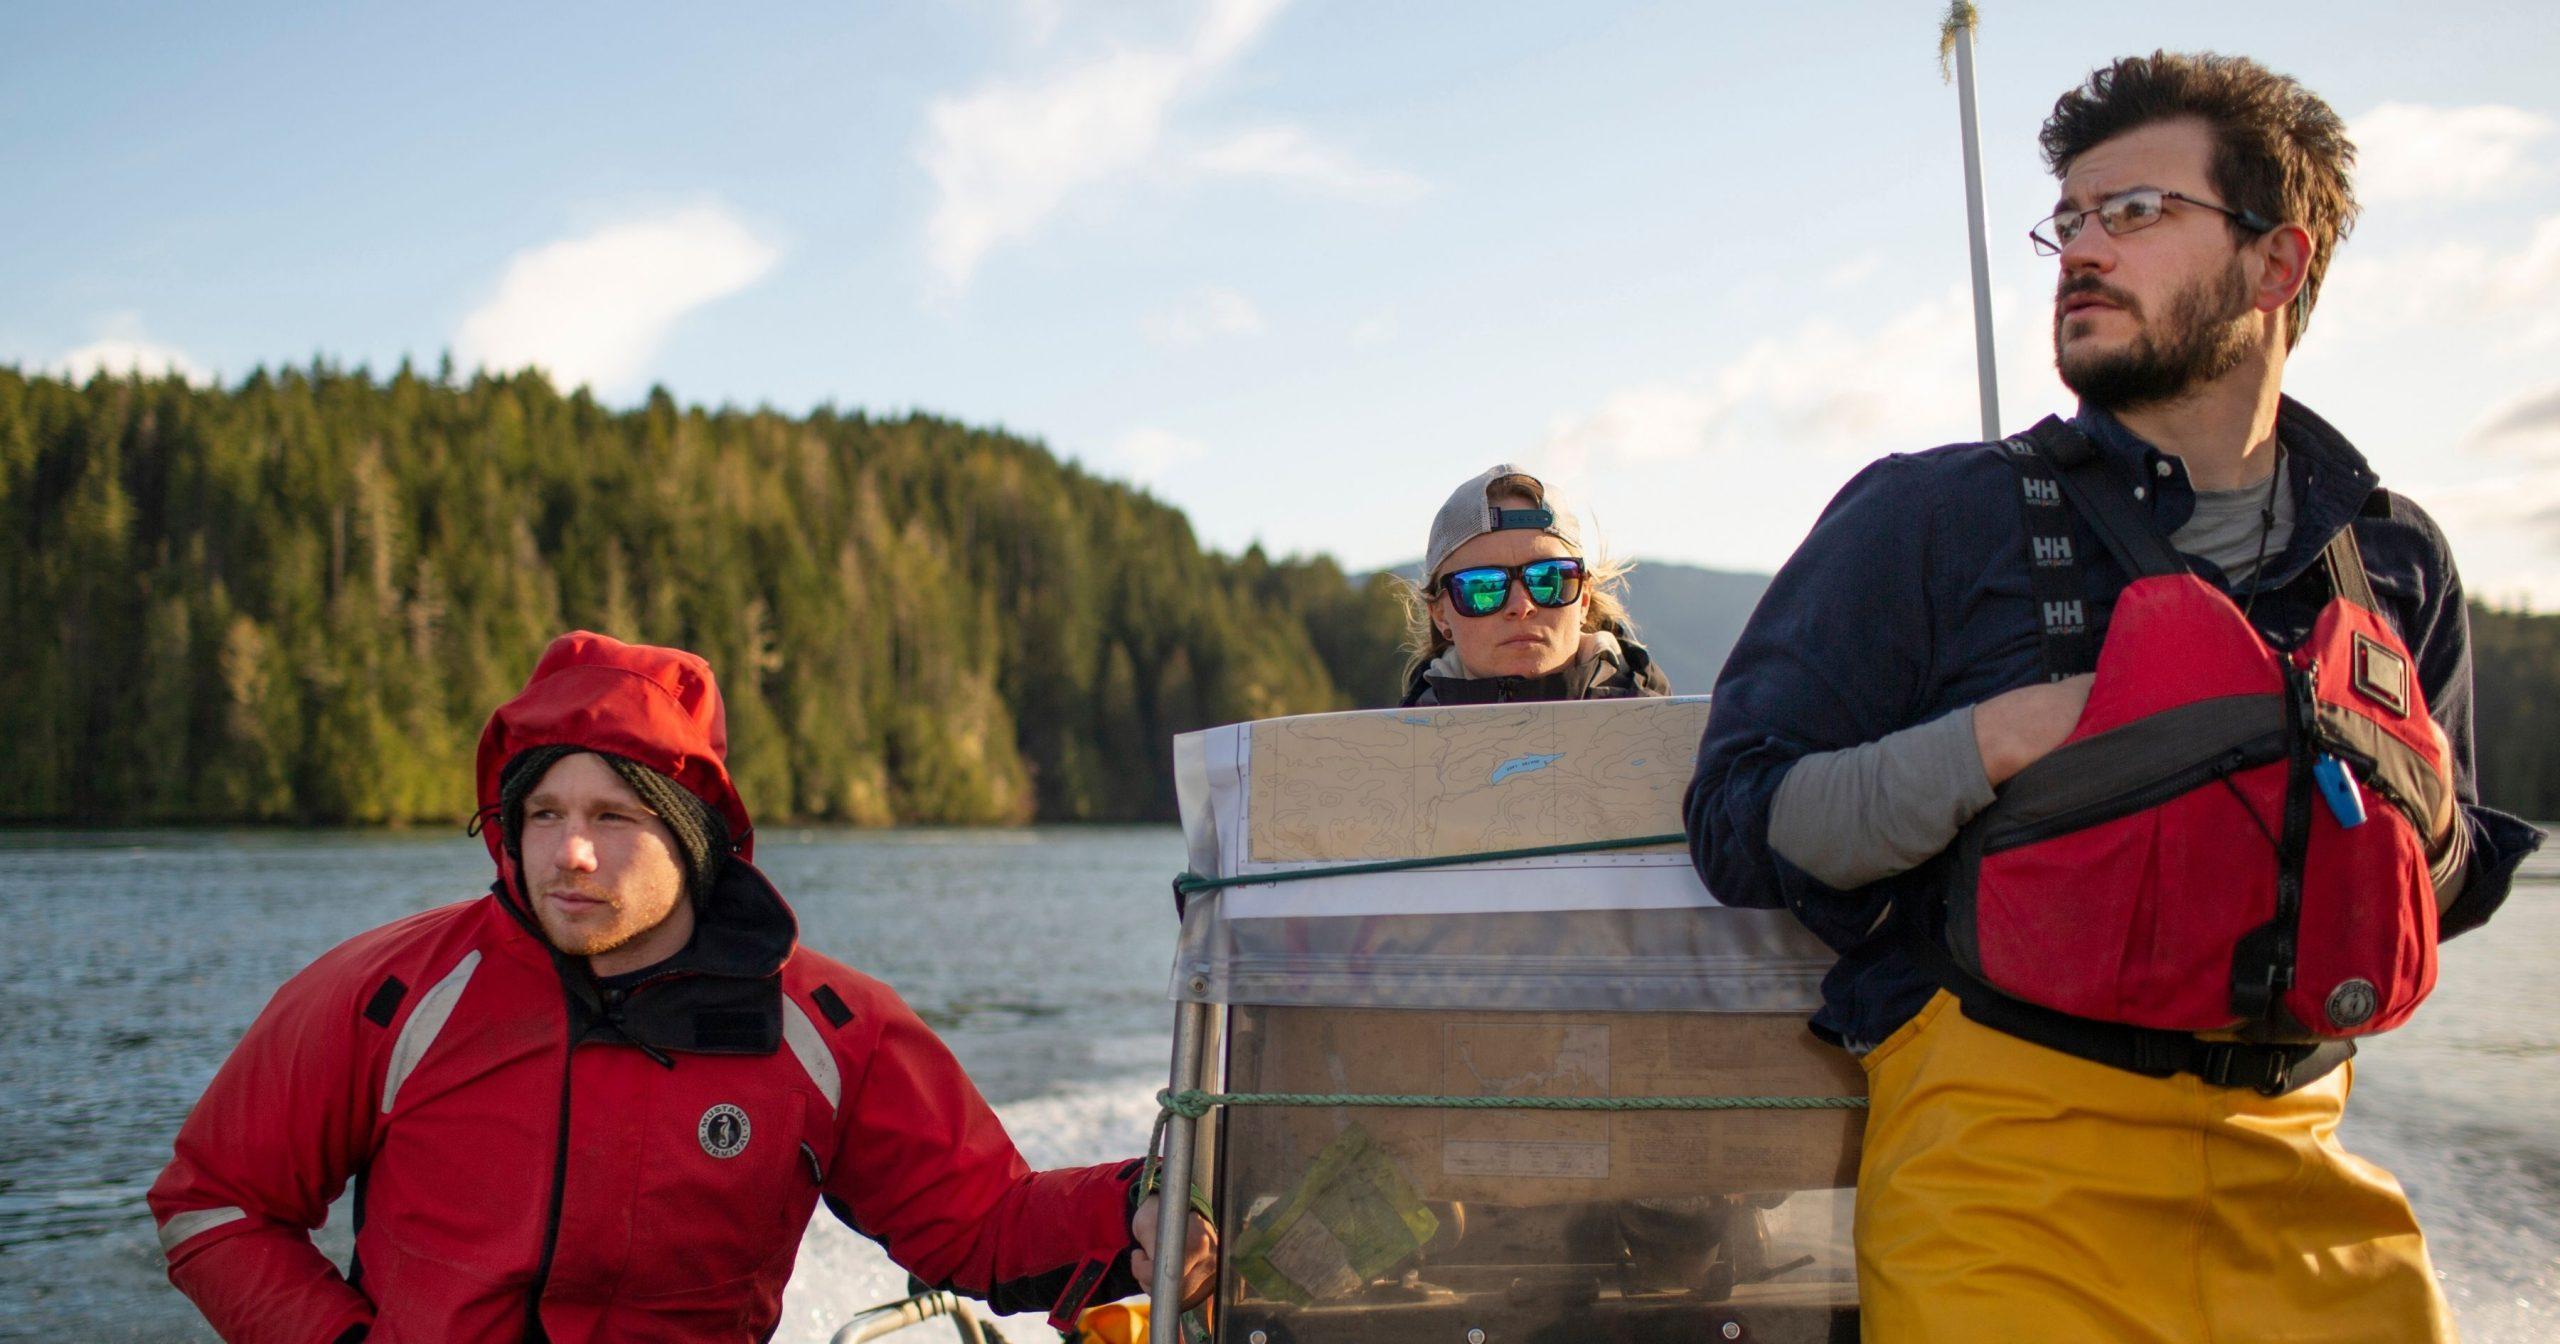 Researchers in a boat